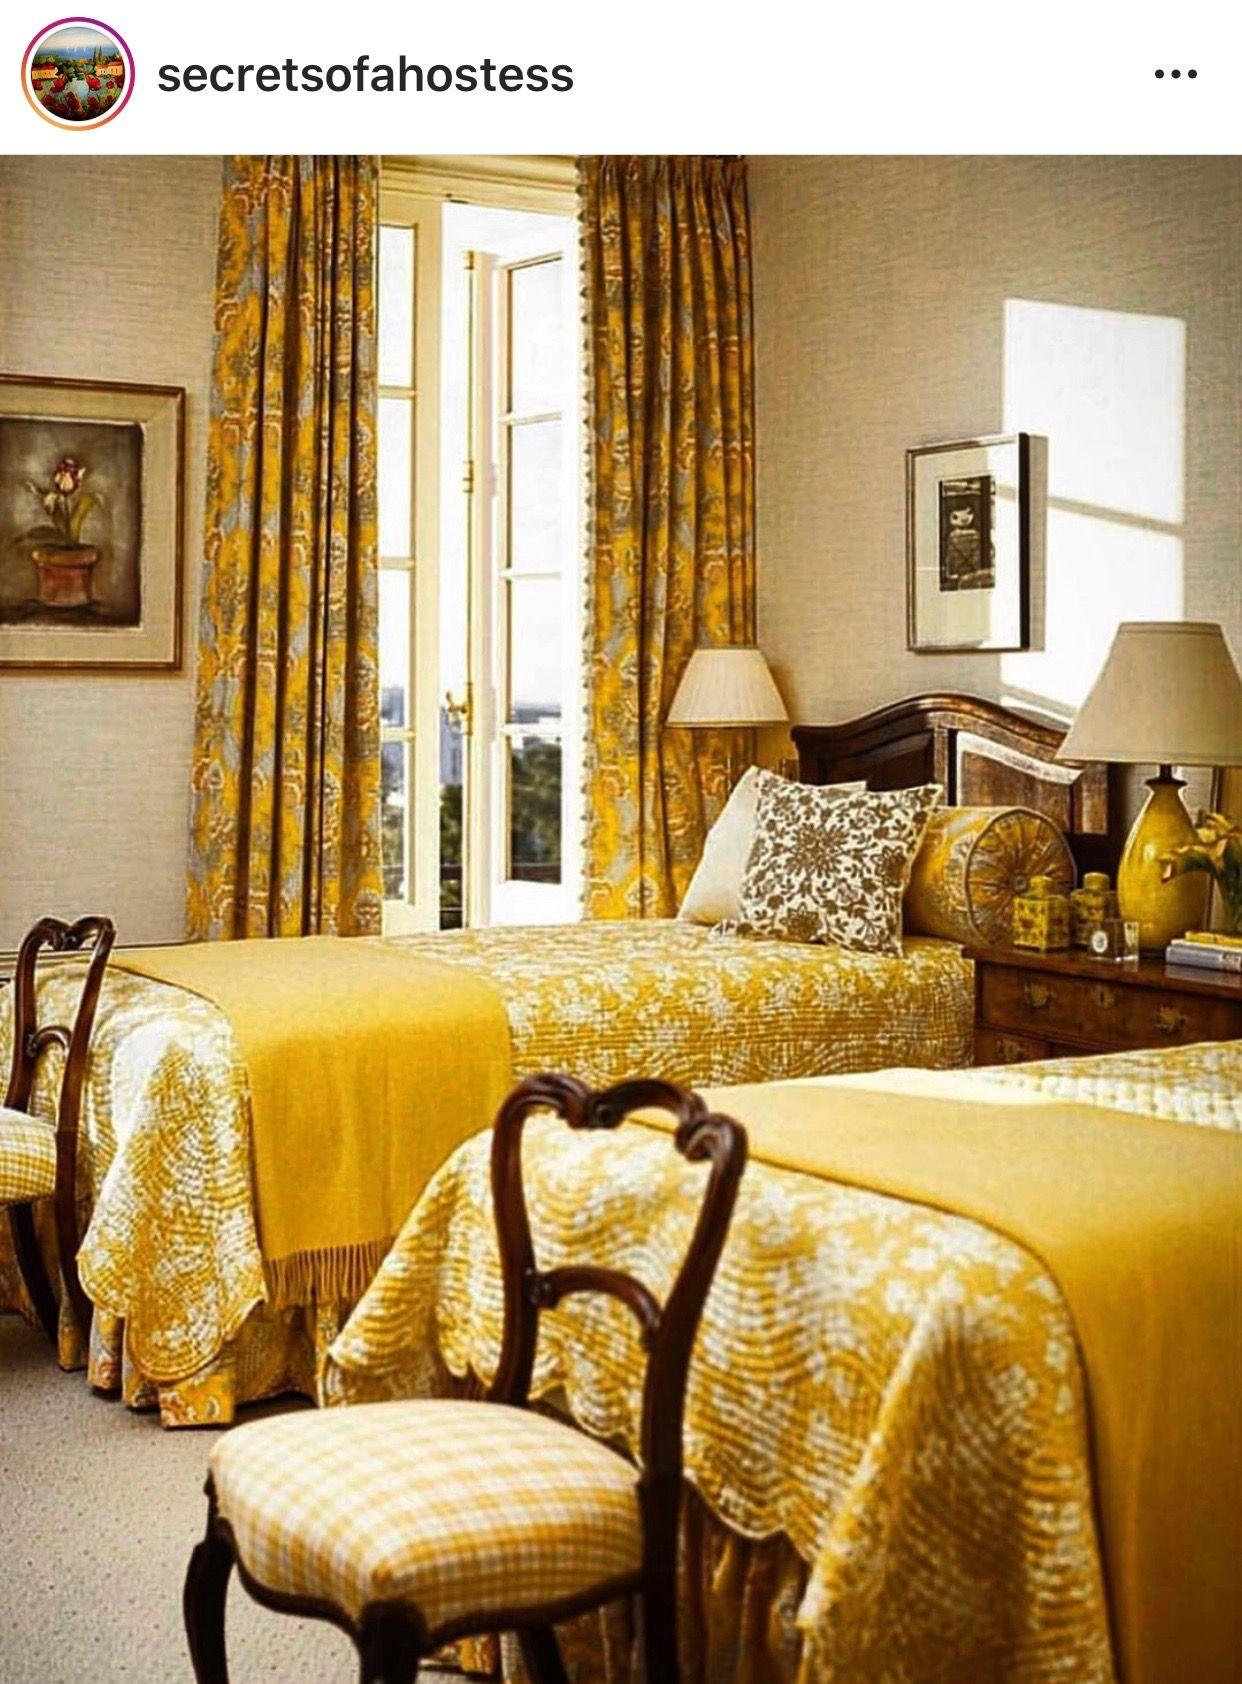 Gracious Guest Bedroom Decorating Ideas: Home, Guest Room, Bedroom Colors